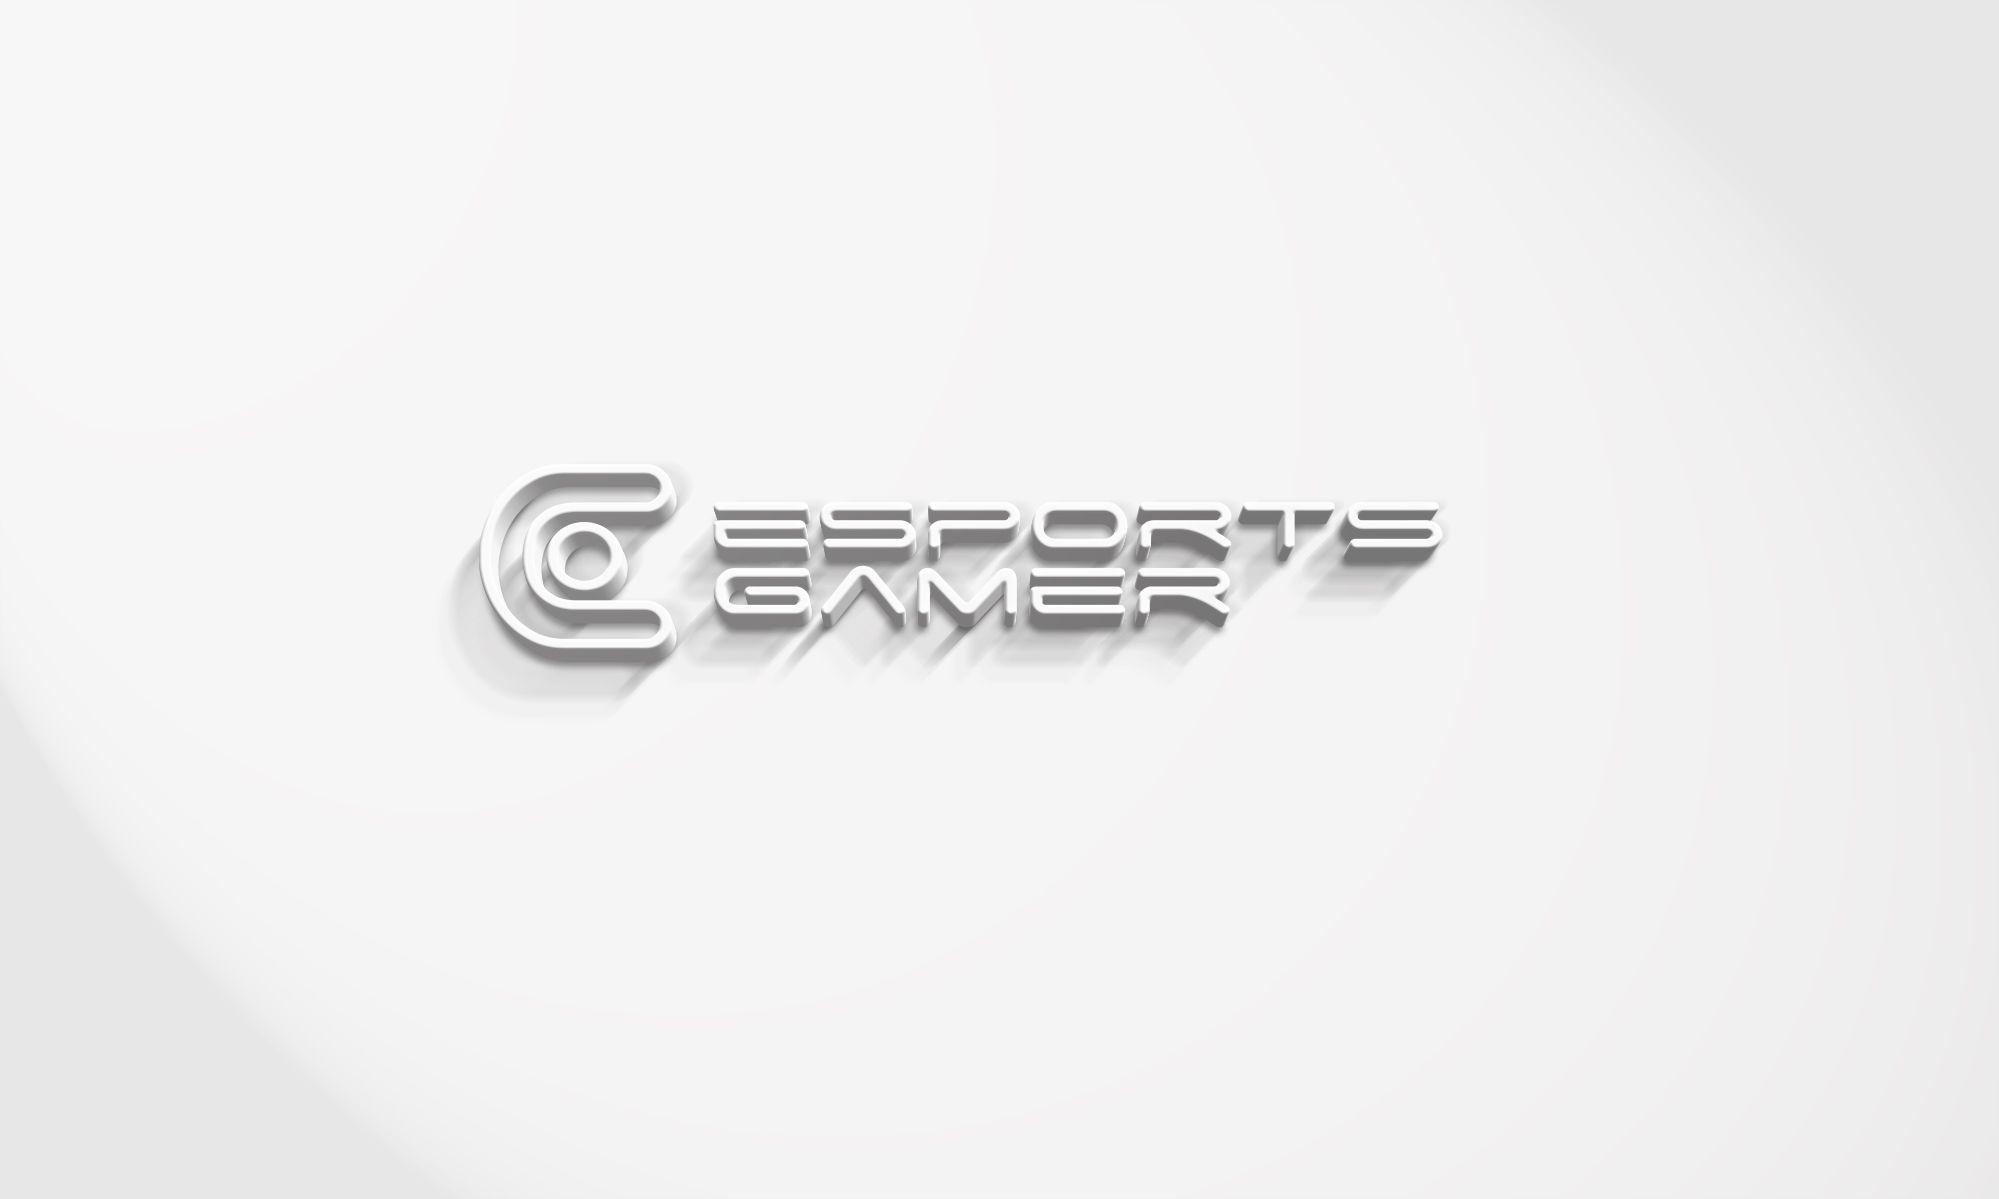 Логотип для киберспортивного (esports) сайта - дизайнер U4po4mak